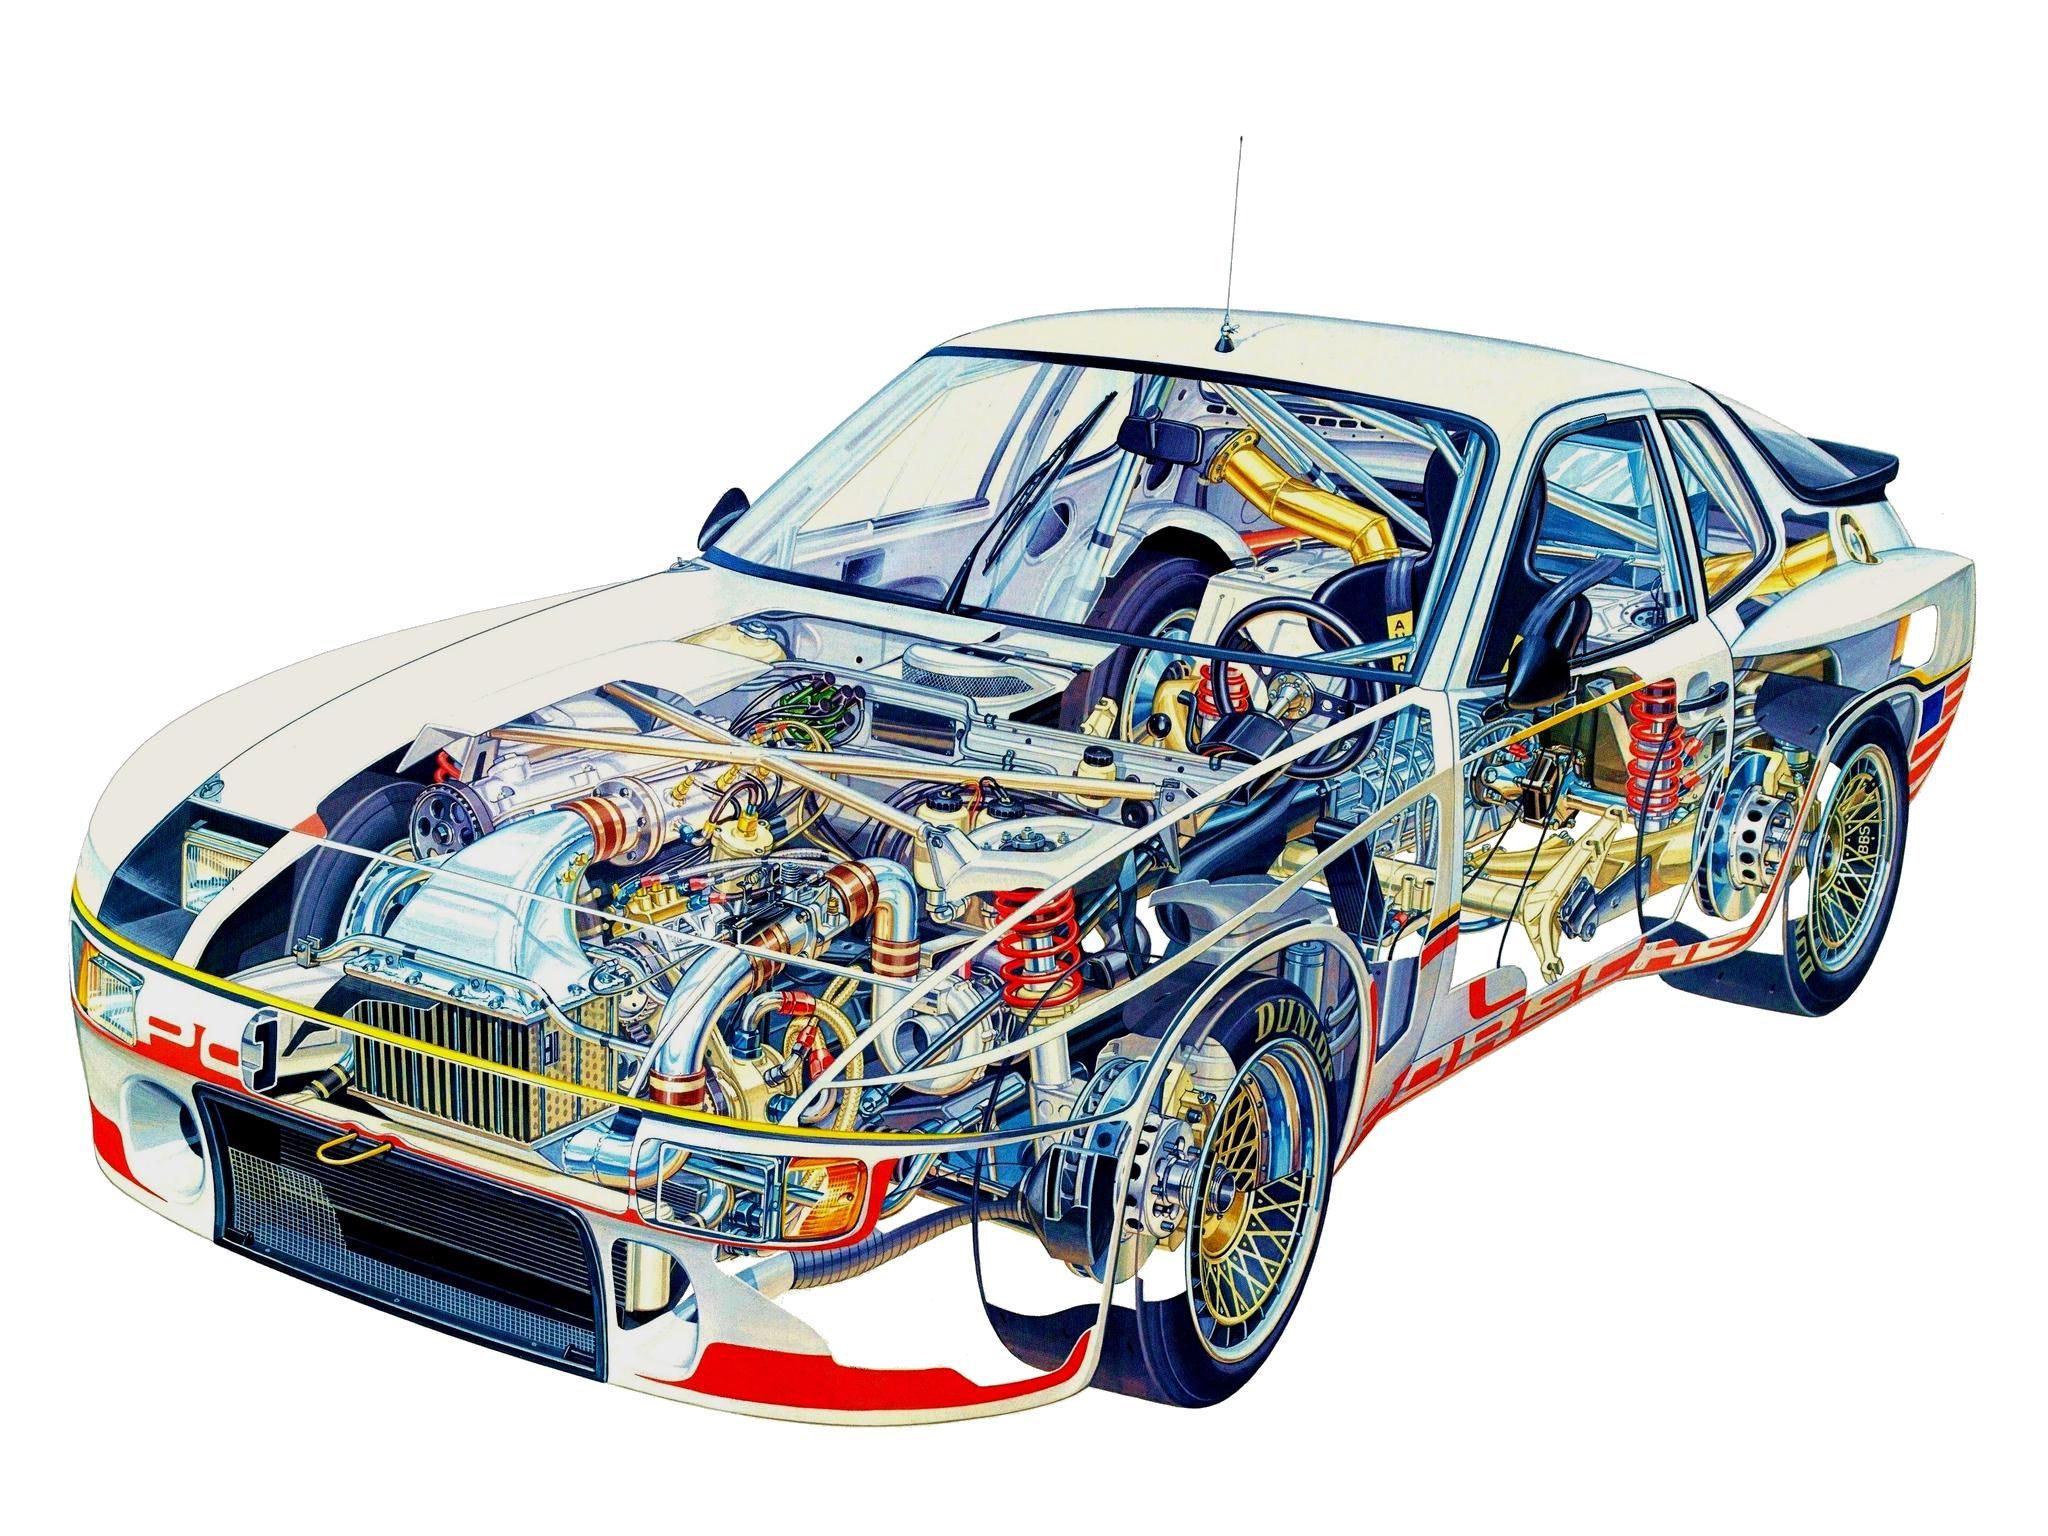 1980 porsche 924 gtp race racing interior engine f wallpaper 2048x1536 187725 wallpaperup - Porsche engine wallpaper ...